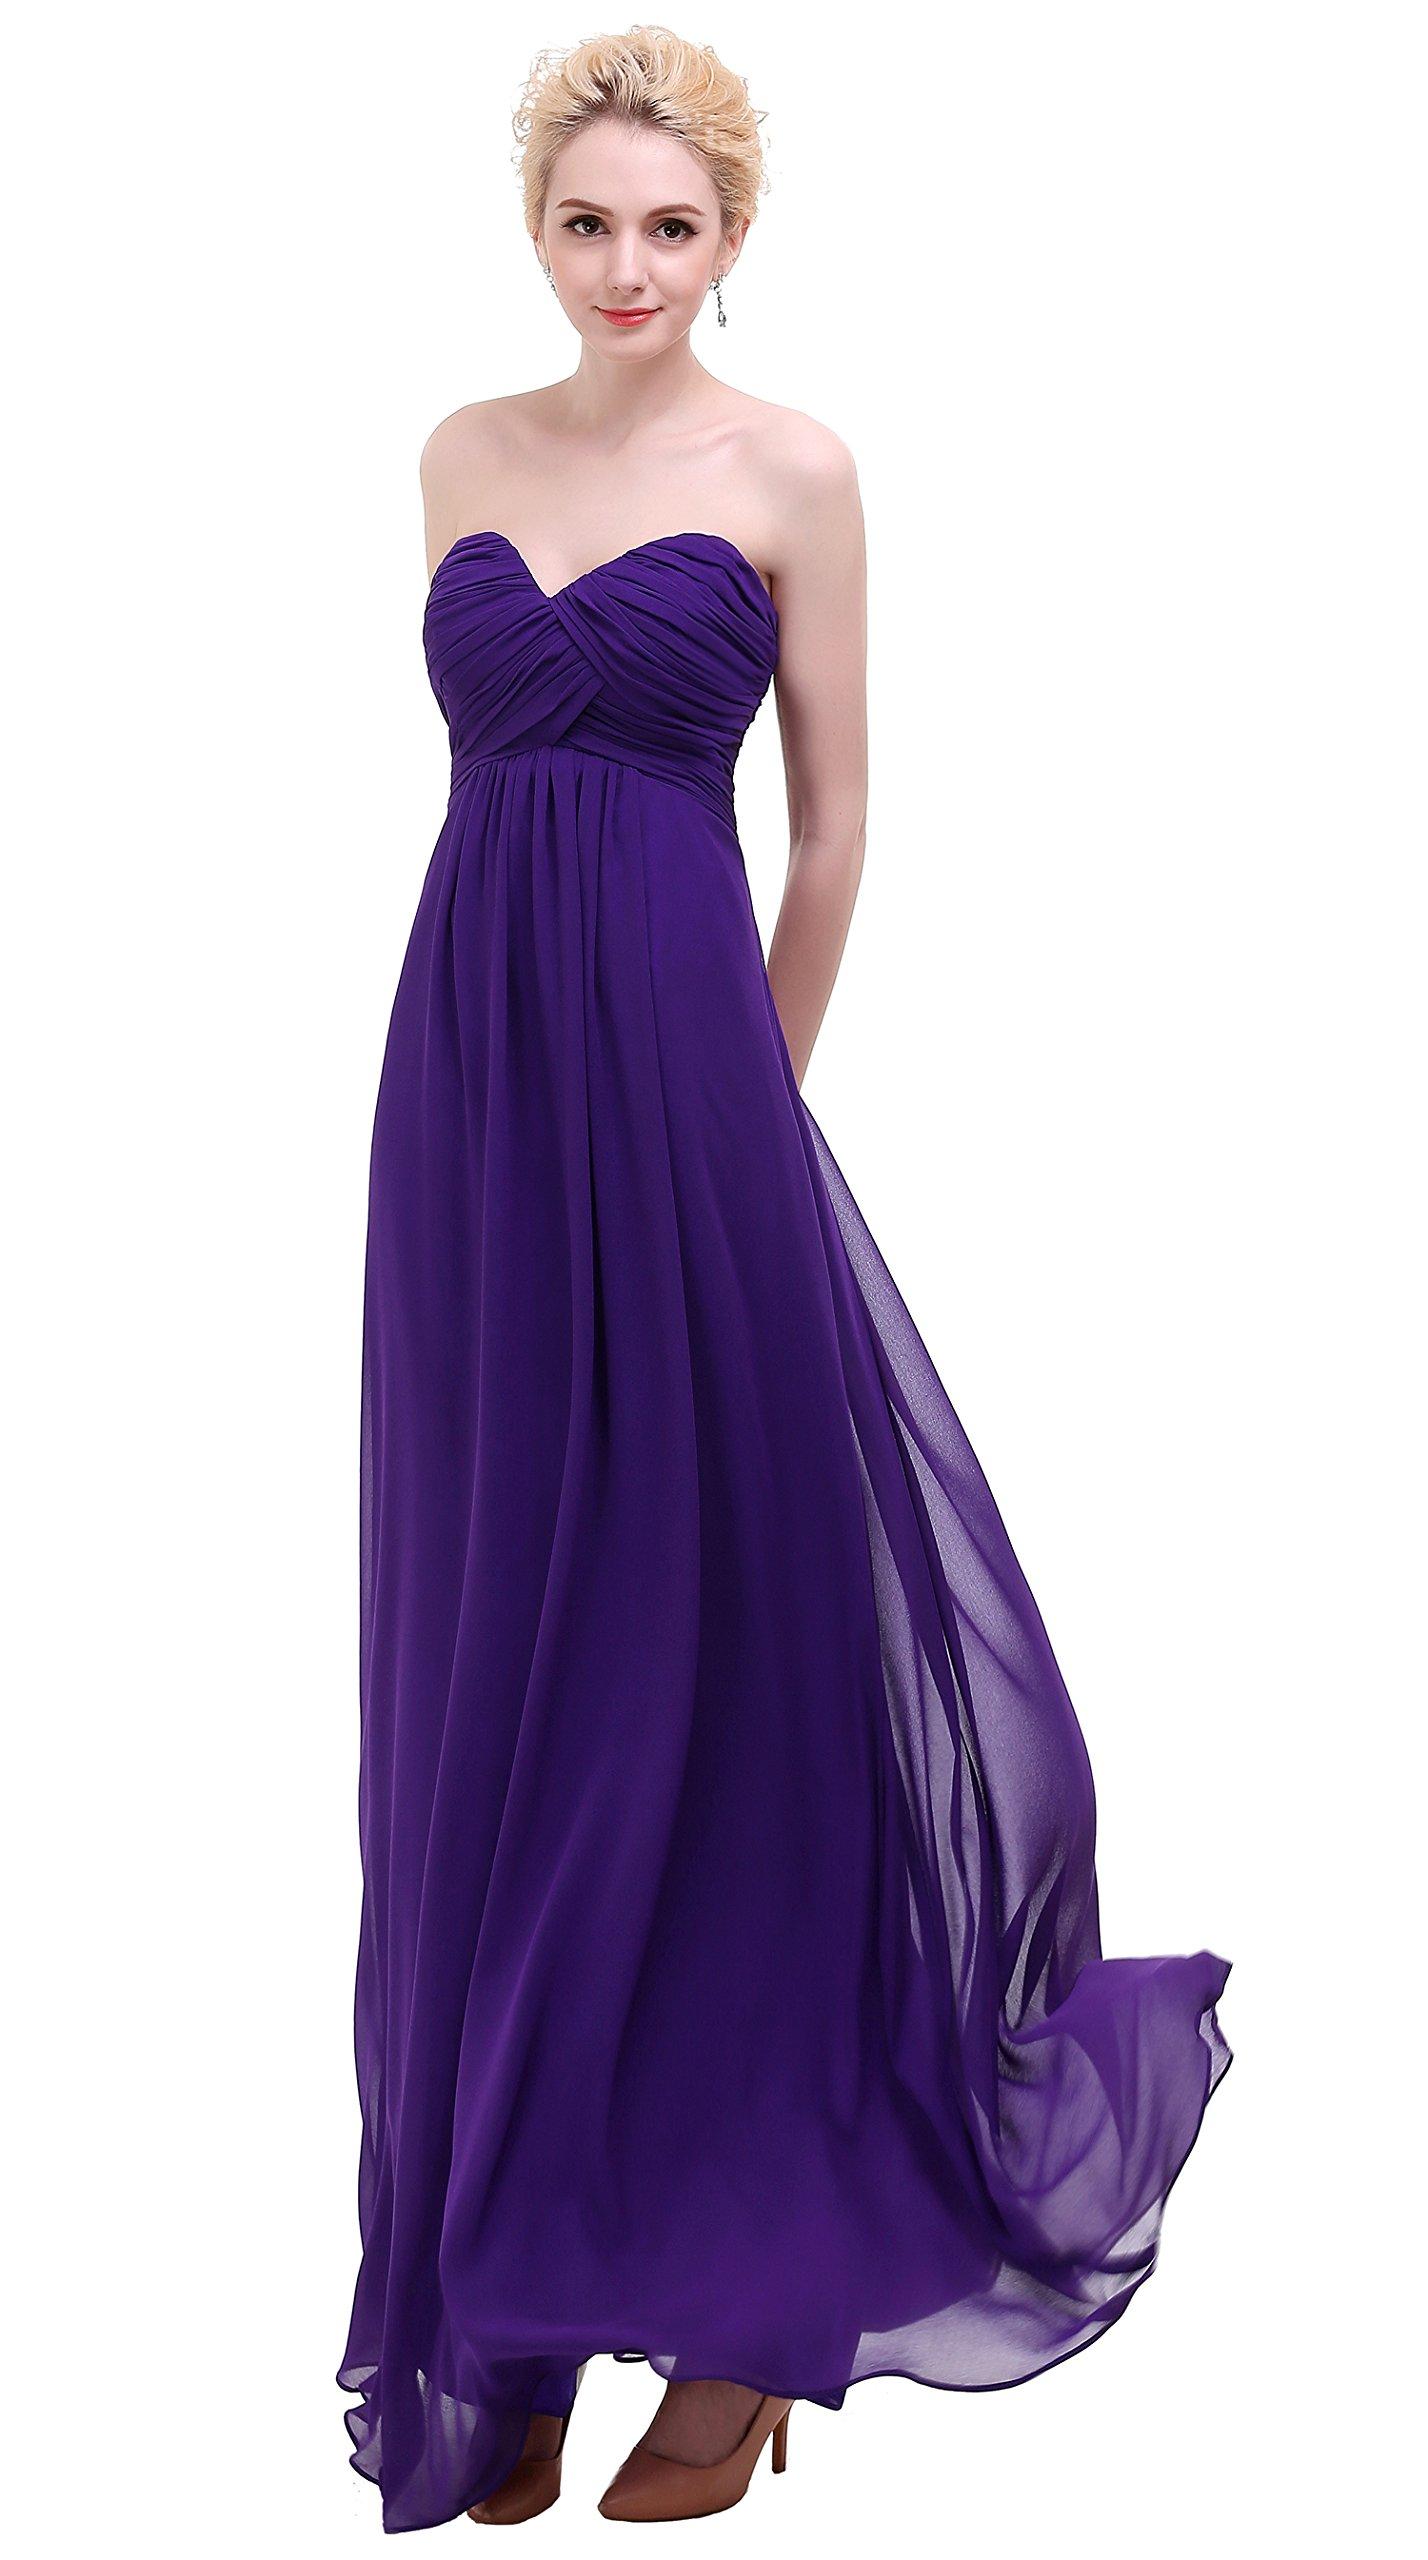 High pink low prom dresses, Hair Grey dye